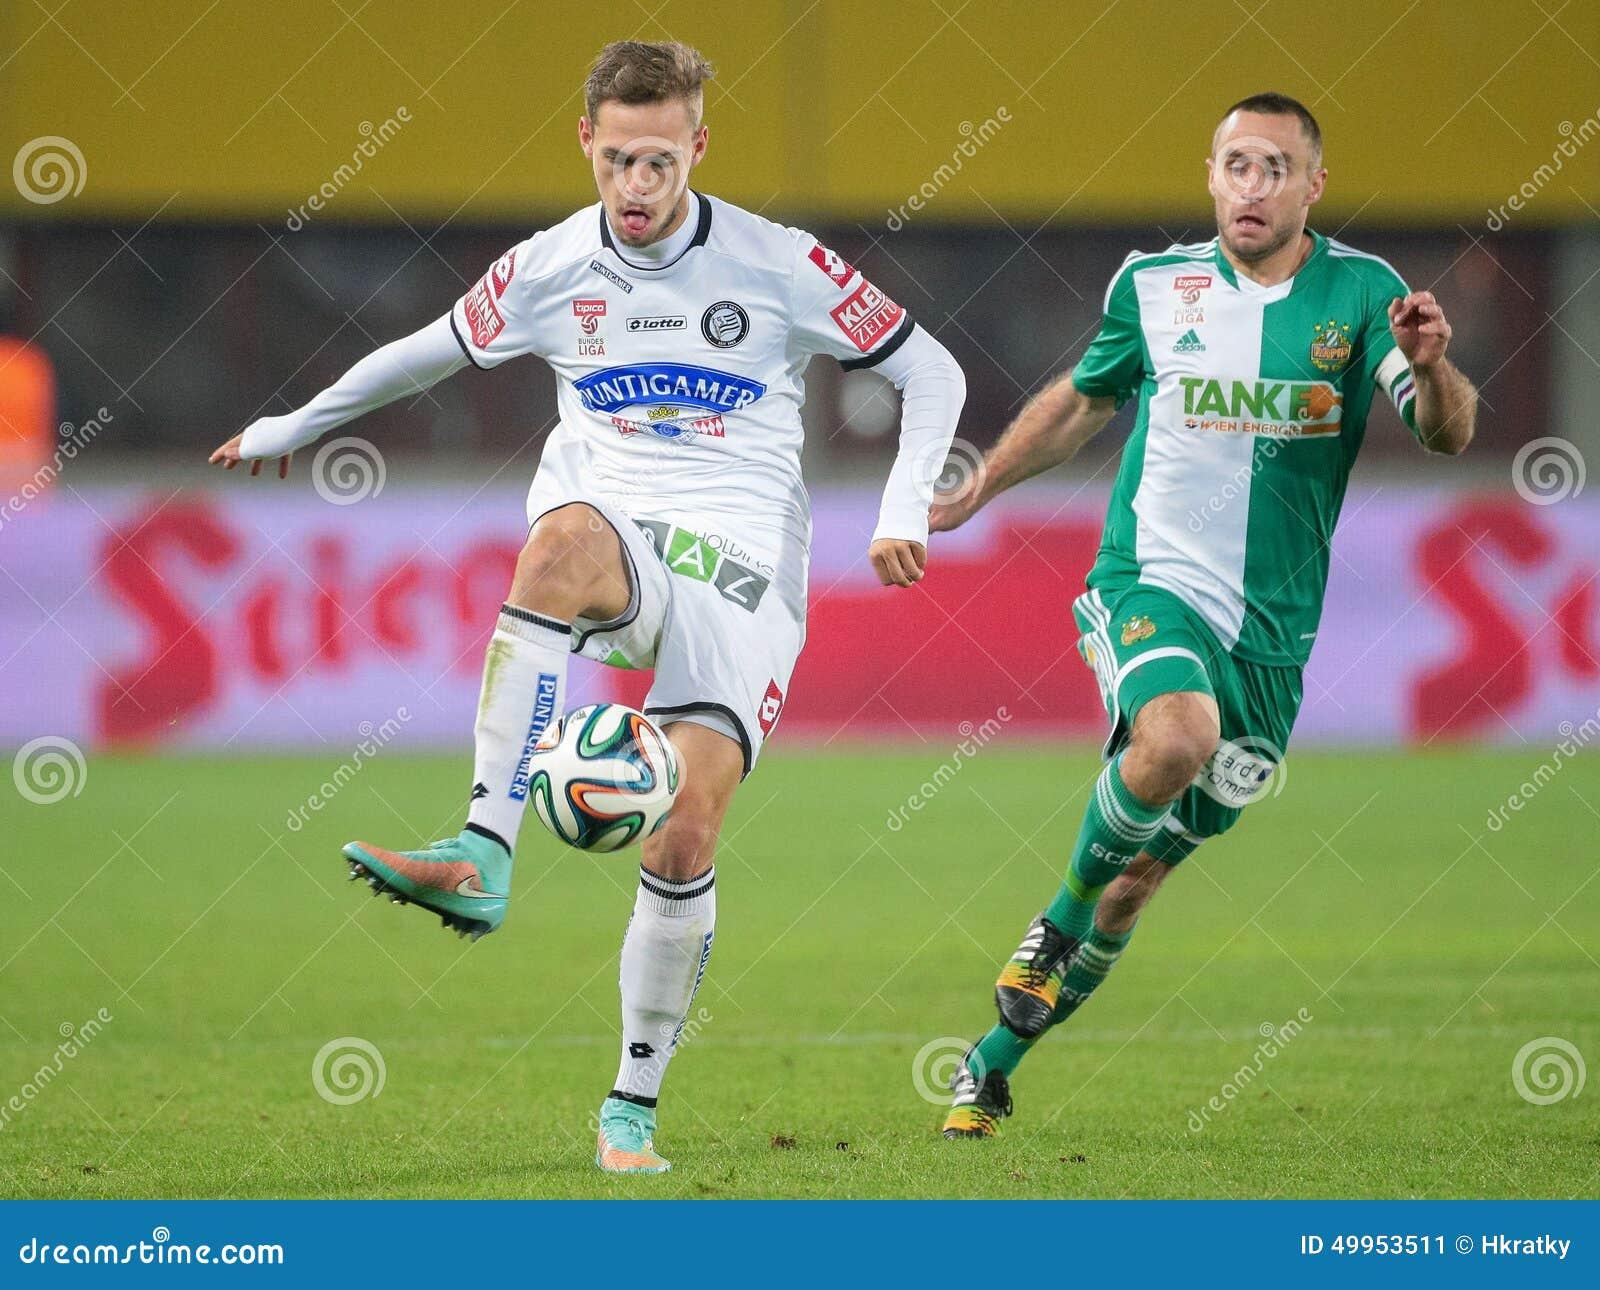 Rapid Vs Sturm Graz Editorial Photo Image Of Game Offense 49953511